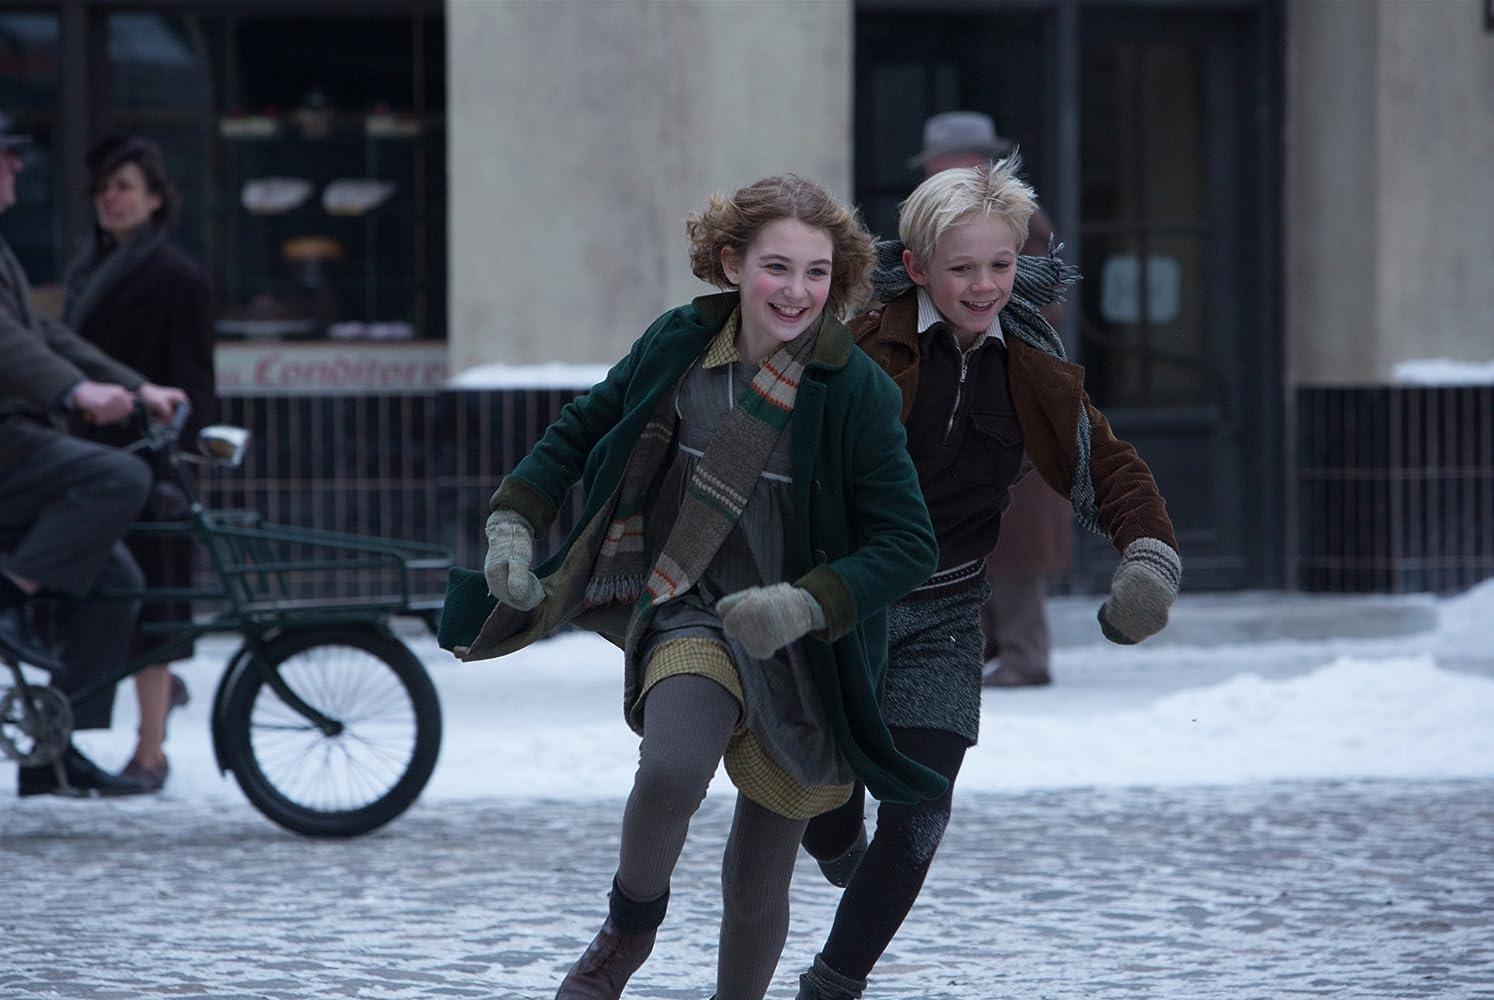 Nico Liersch and Sophie Nélisse in The Book Thief (2013)